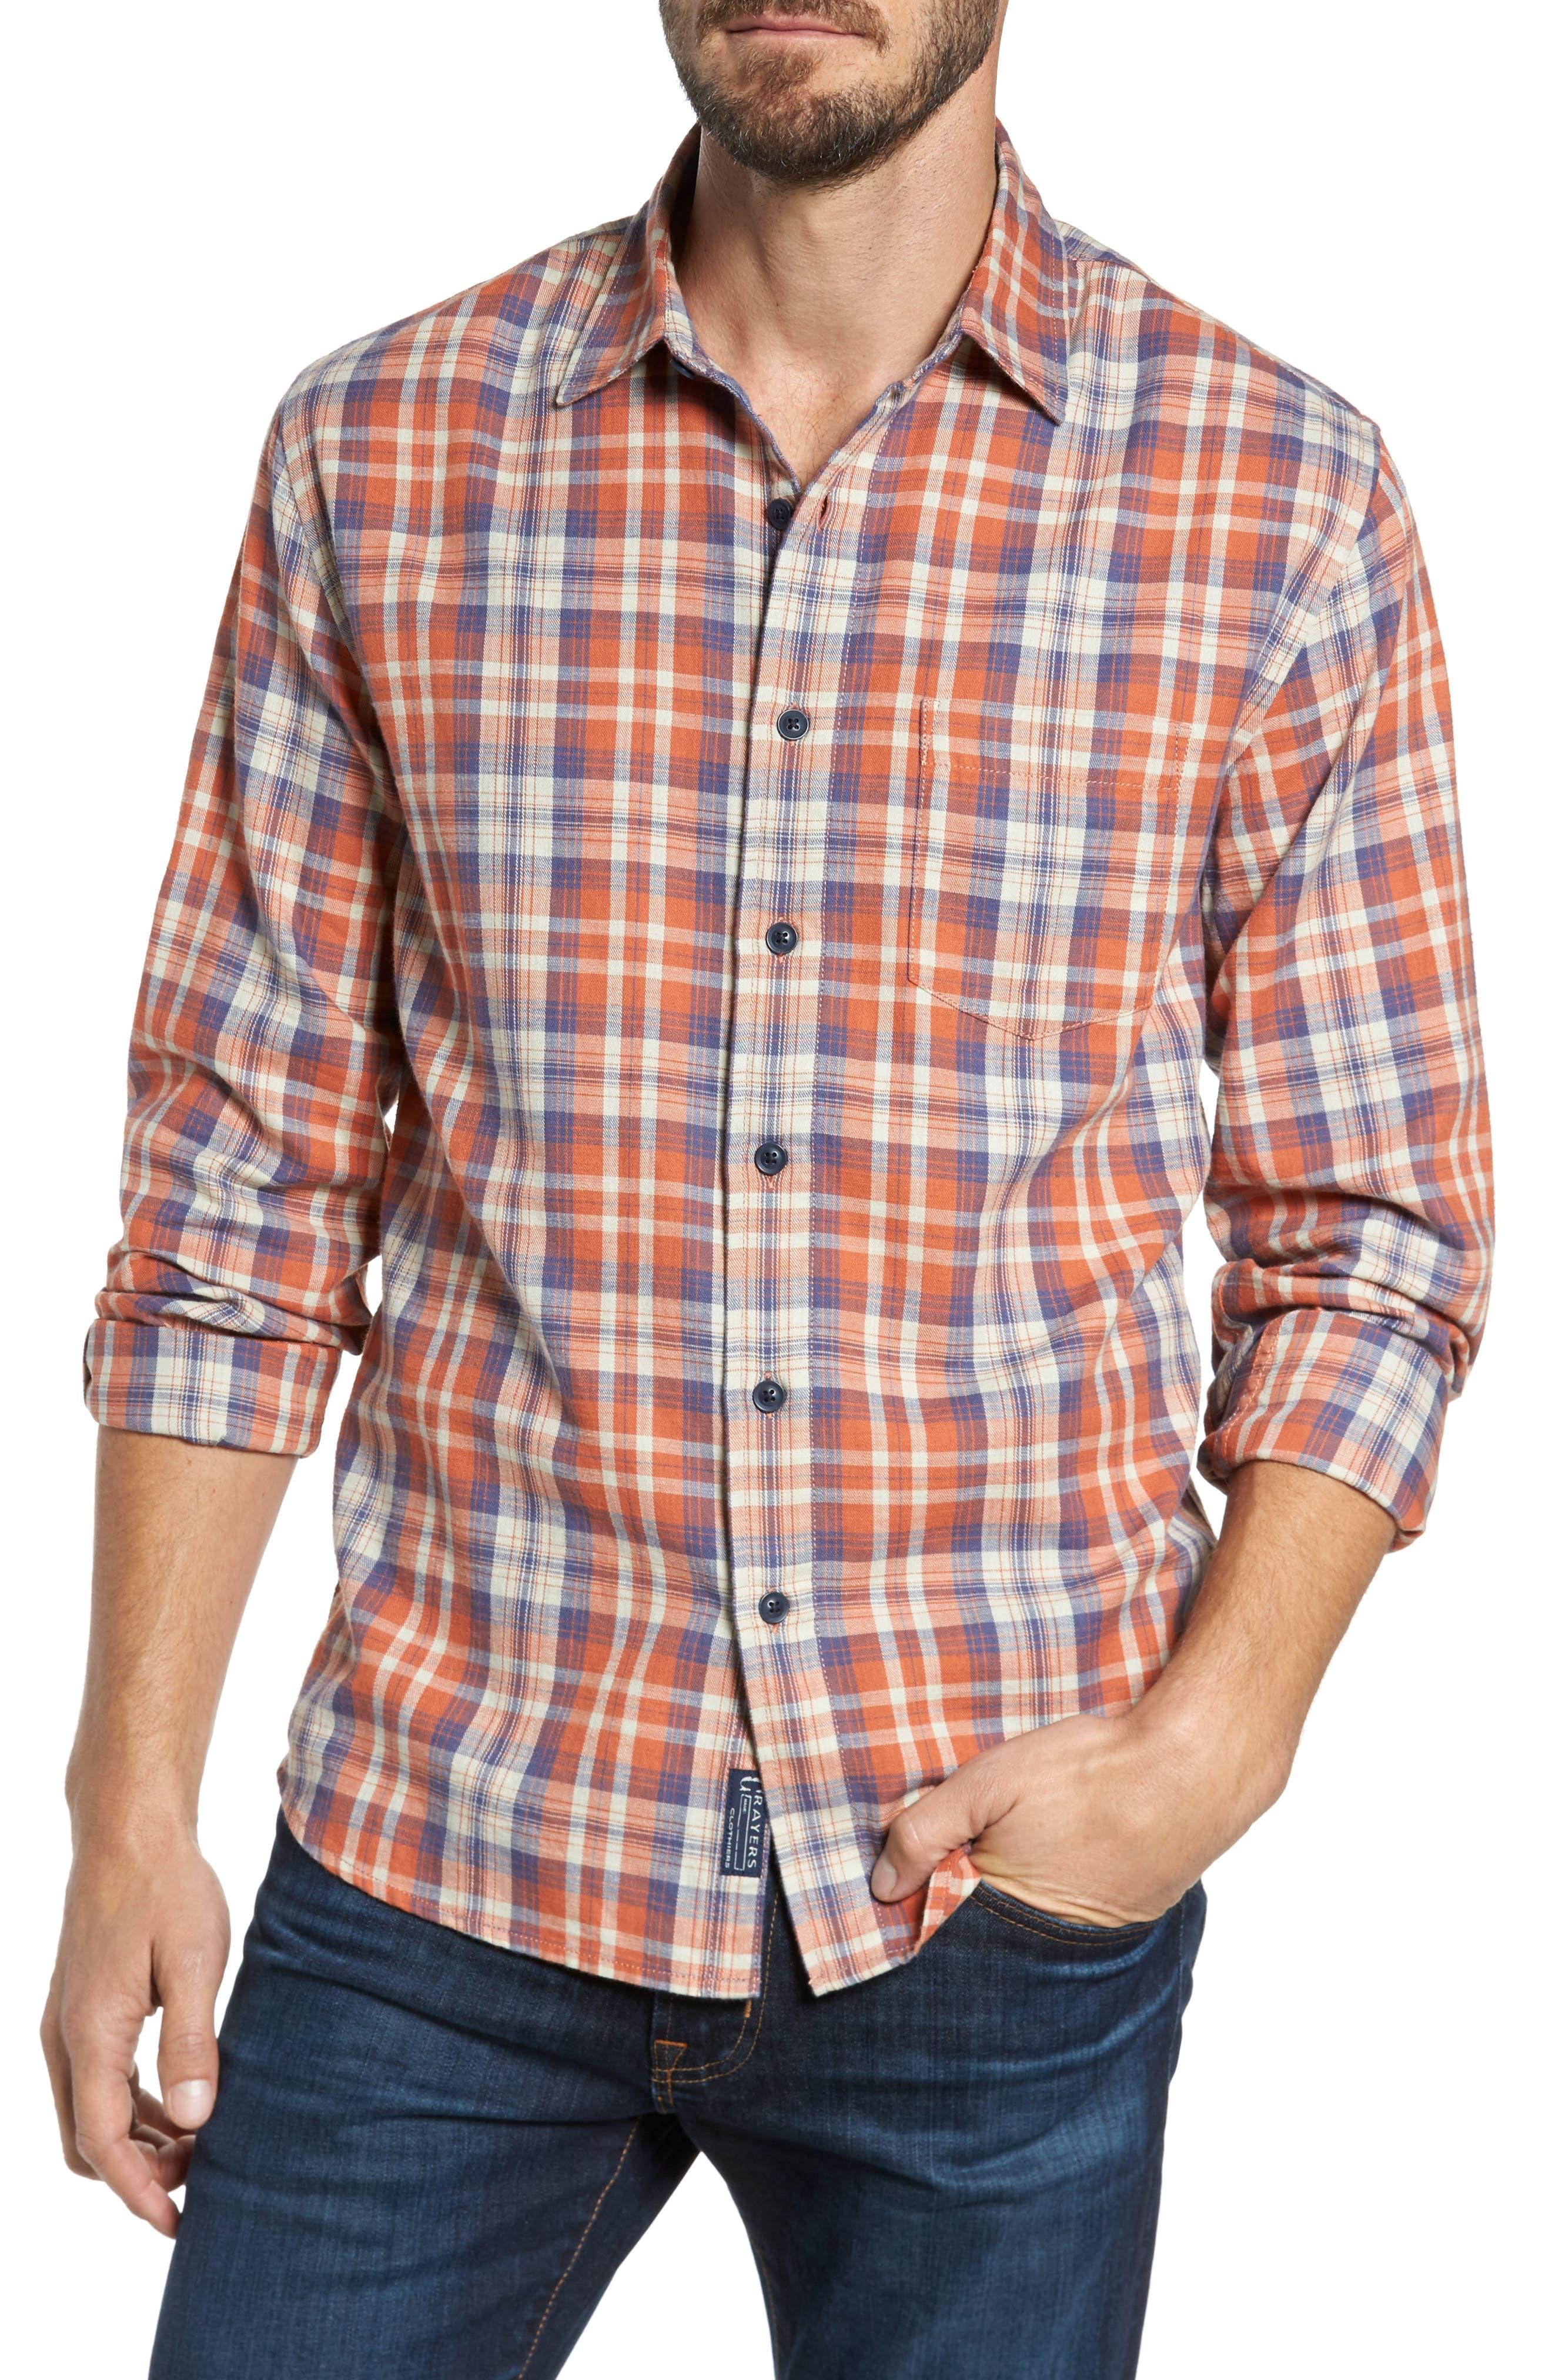 Scottsdale Slim Fit Plaid Slub Twill Sport Shirt,                         Main,                         color, Brunt Orange